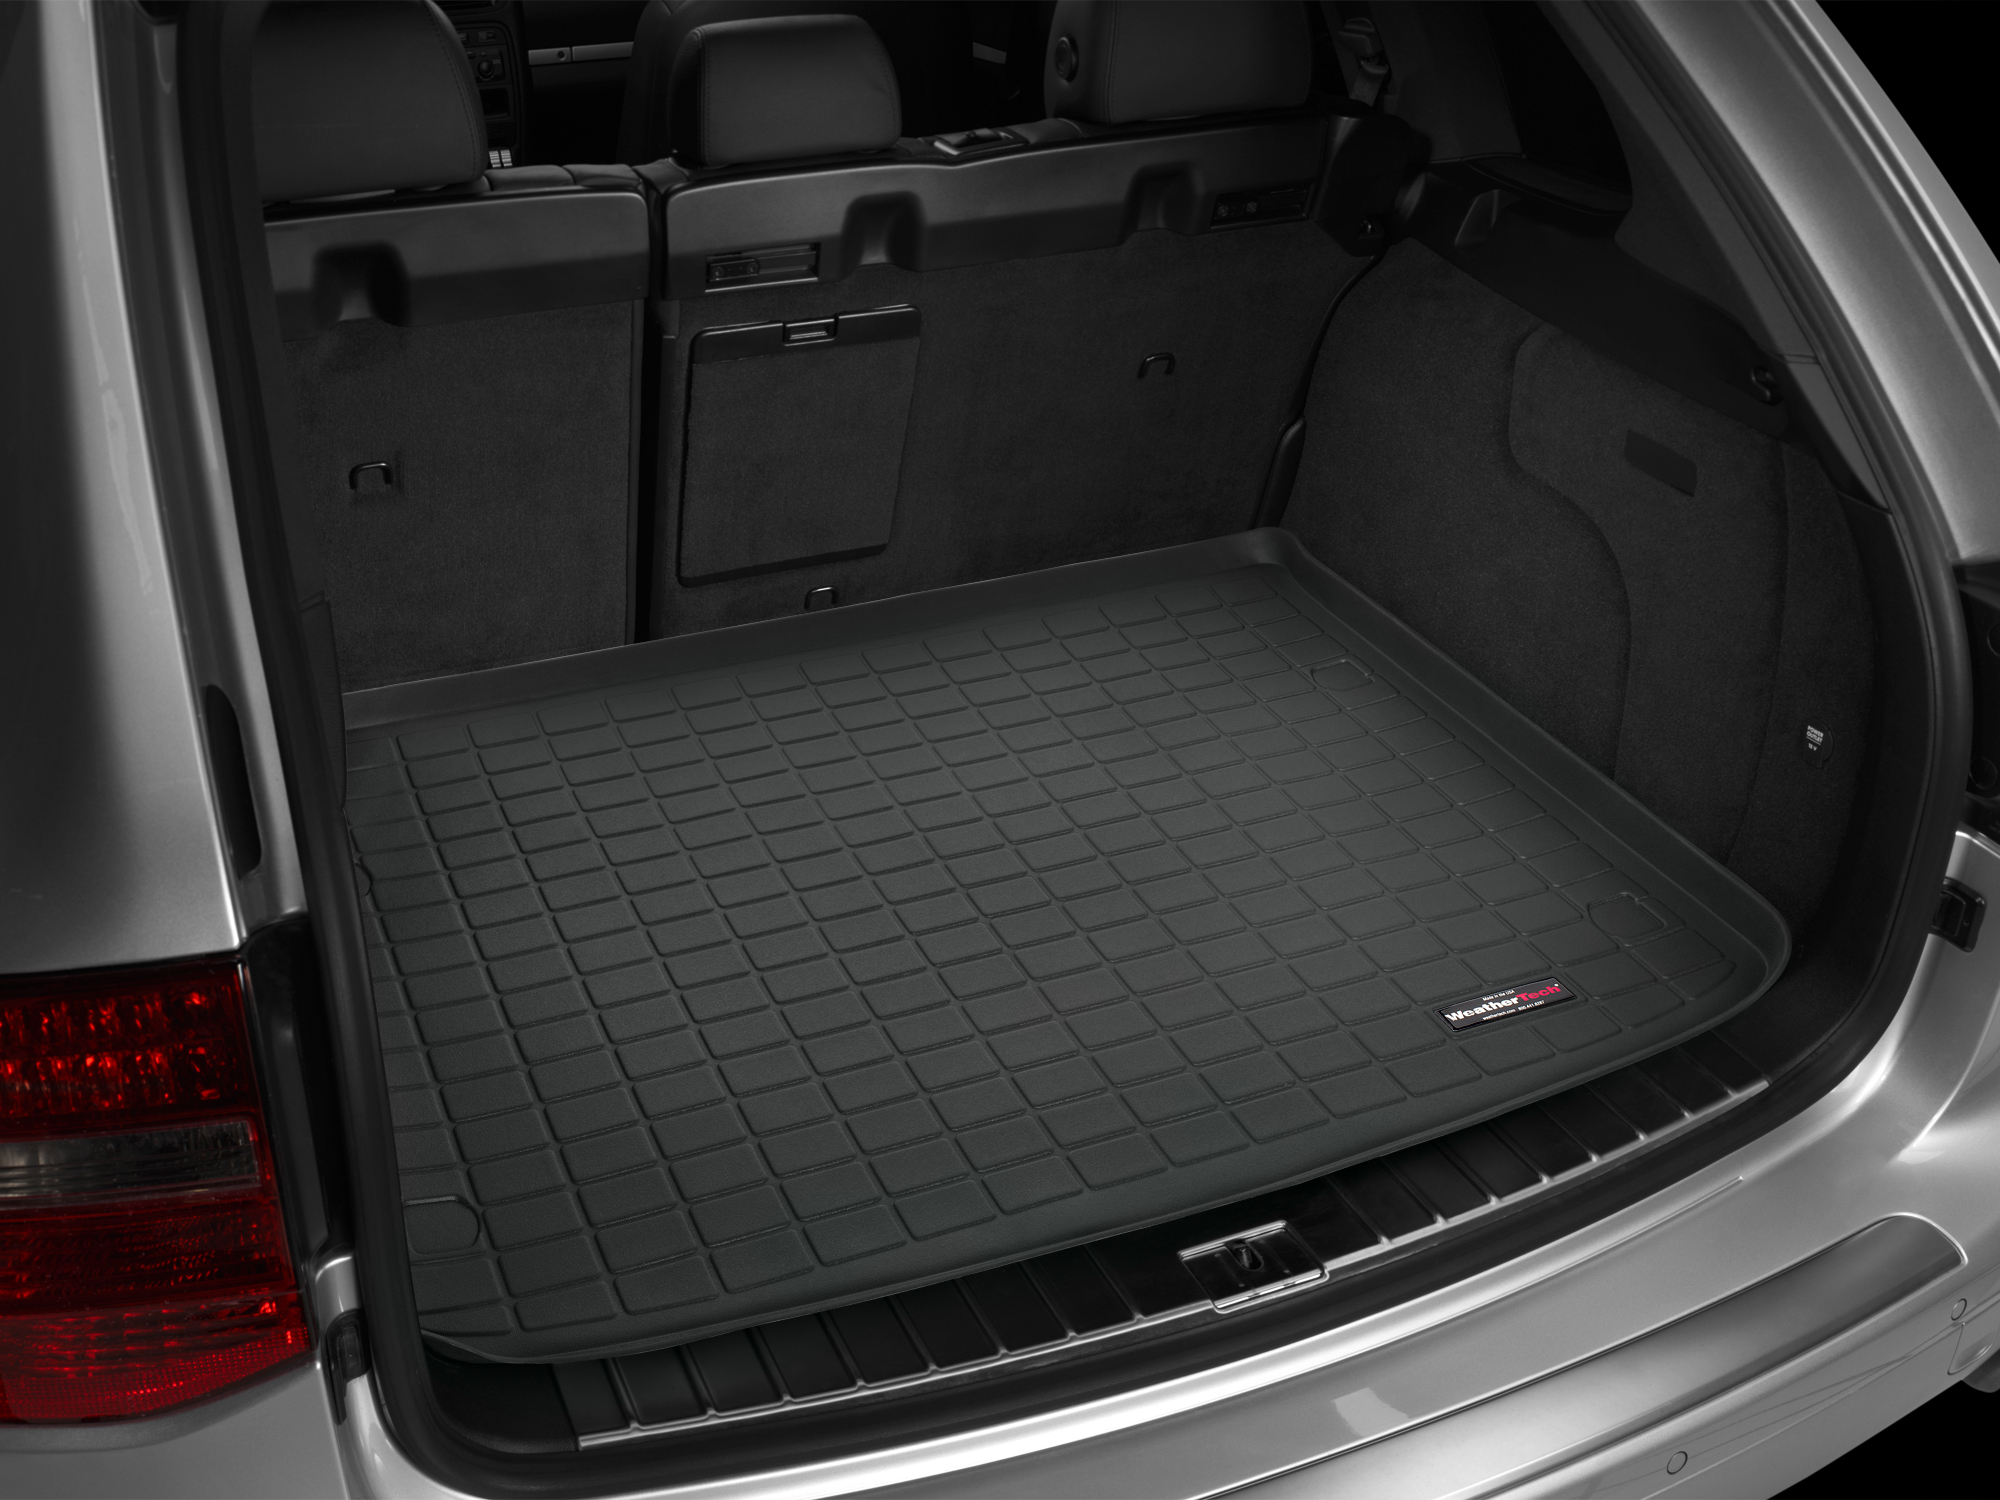 Volkswagen Touareg 2010>2010 Vasca baule tappeto bagagliaio nero *1433